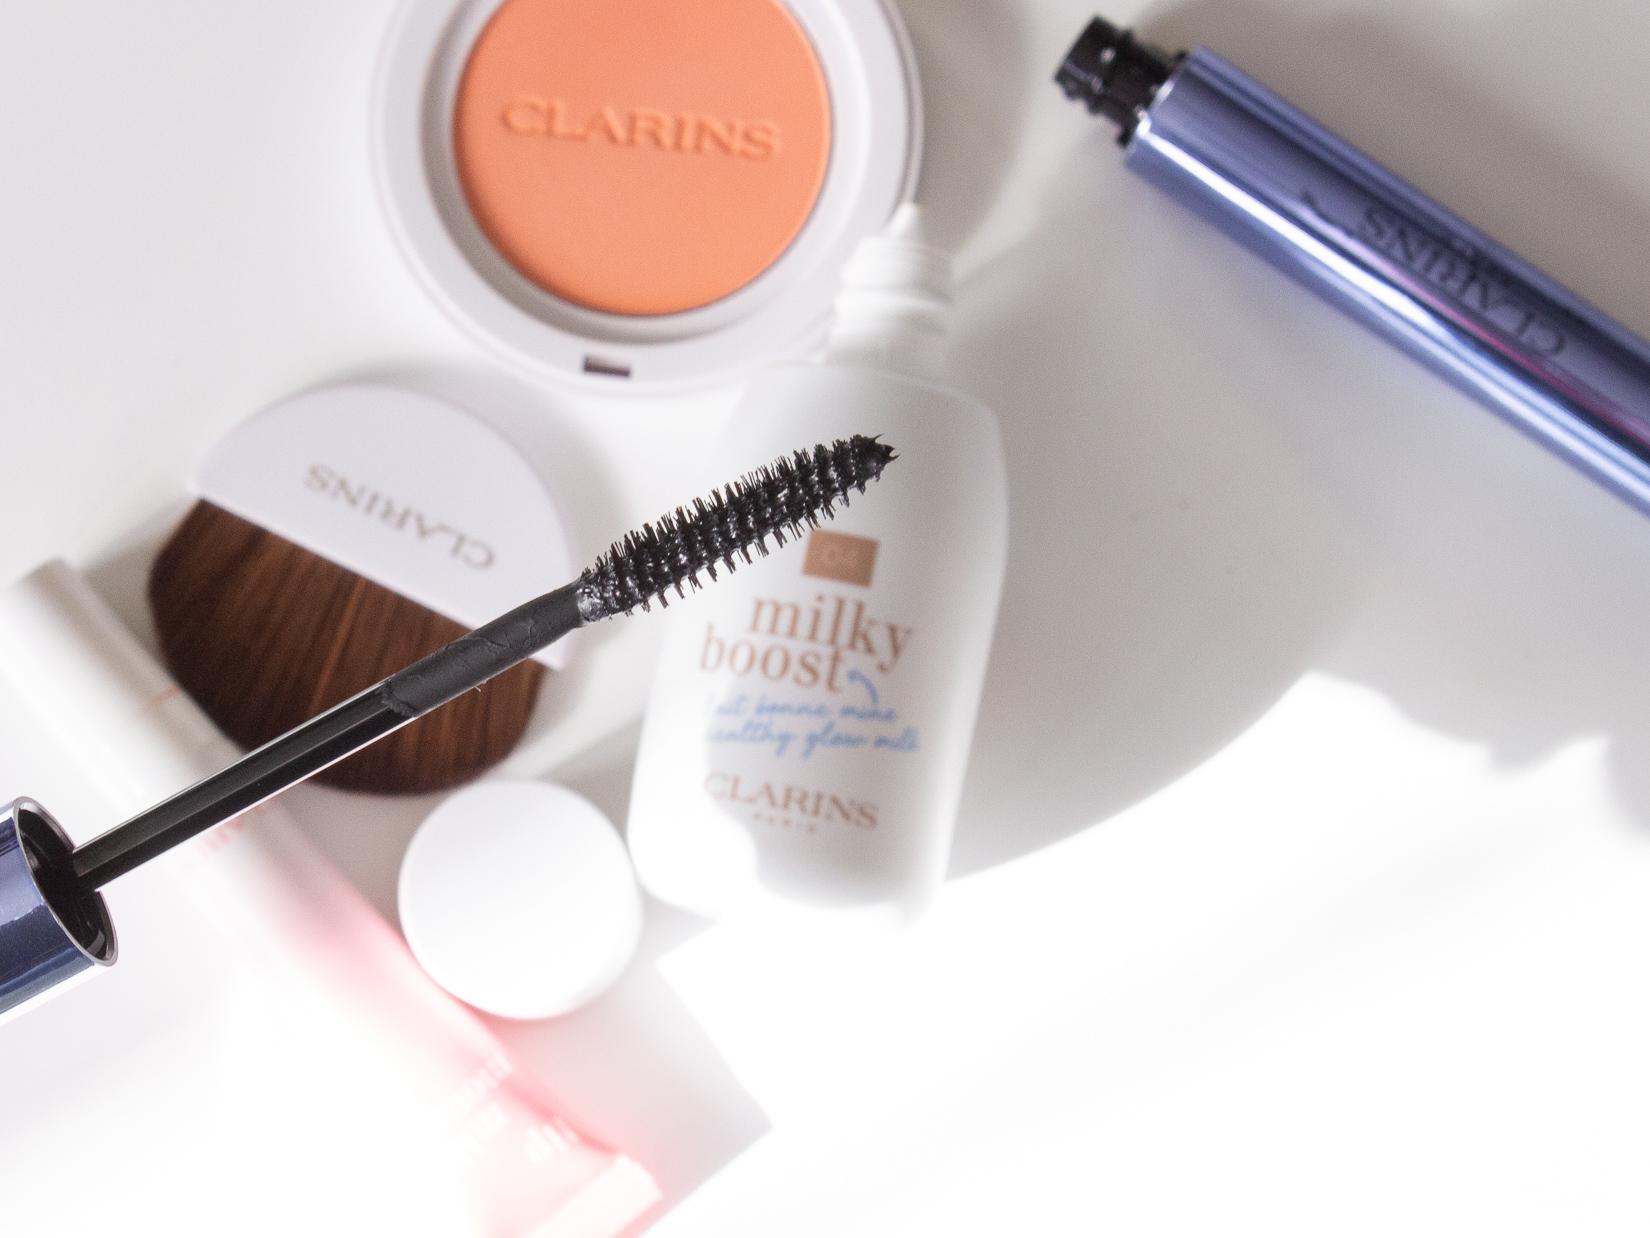 clarins wonderperfect mascara 4D waterproof recenze